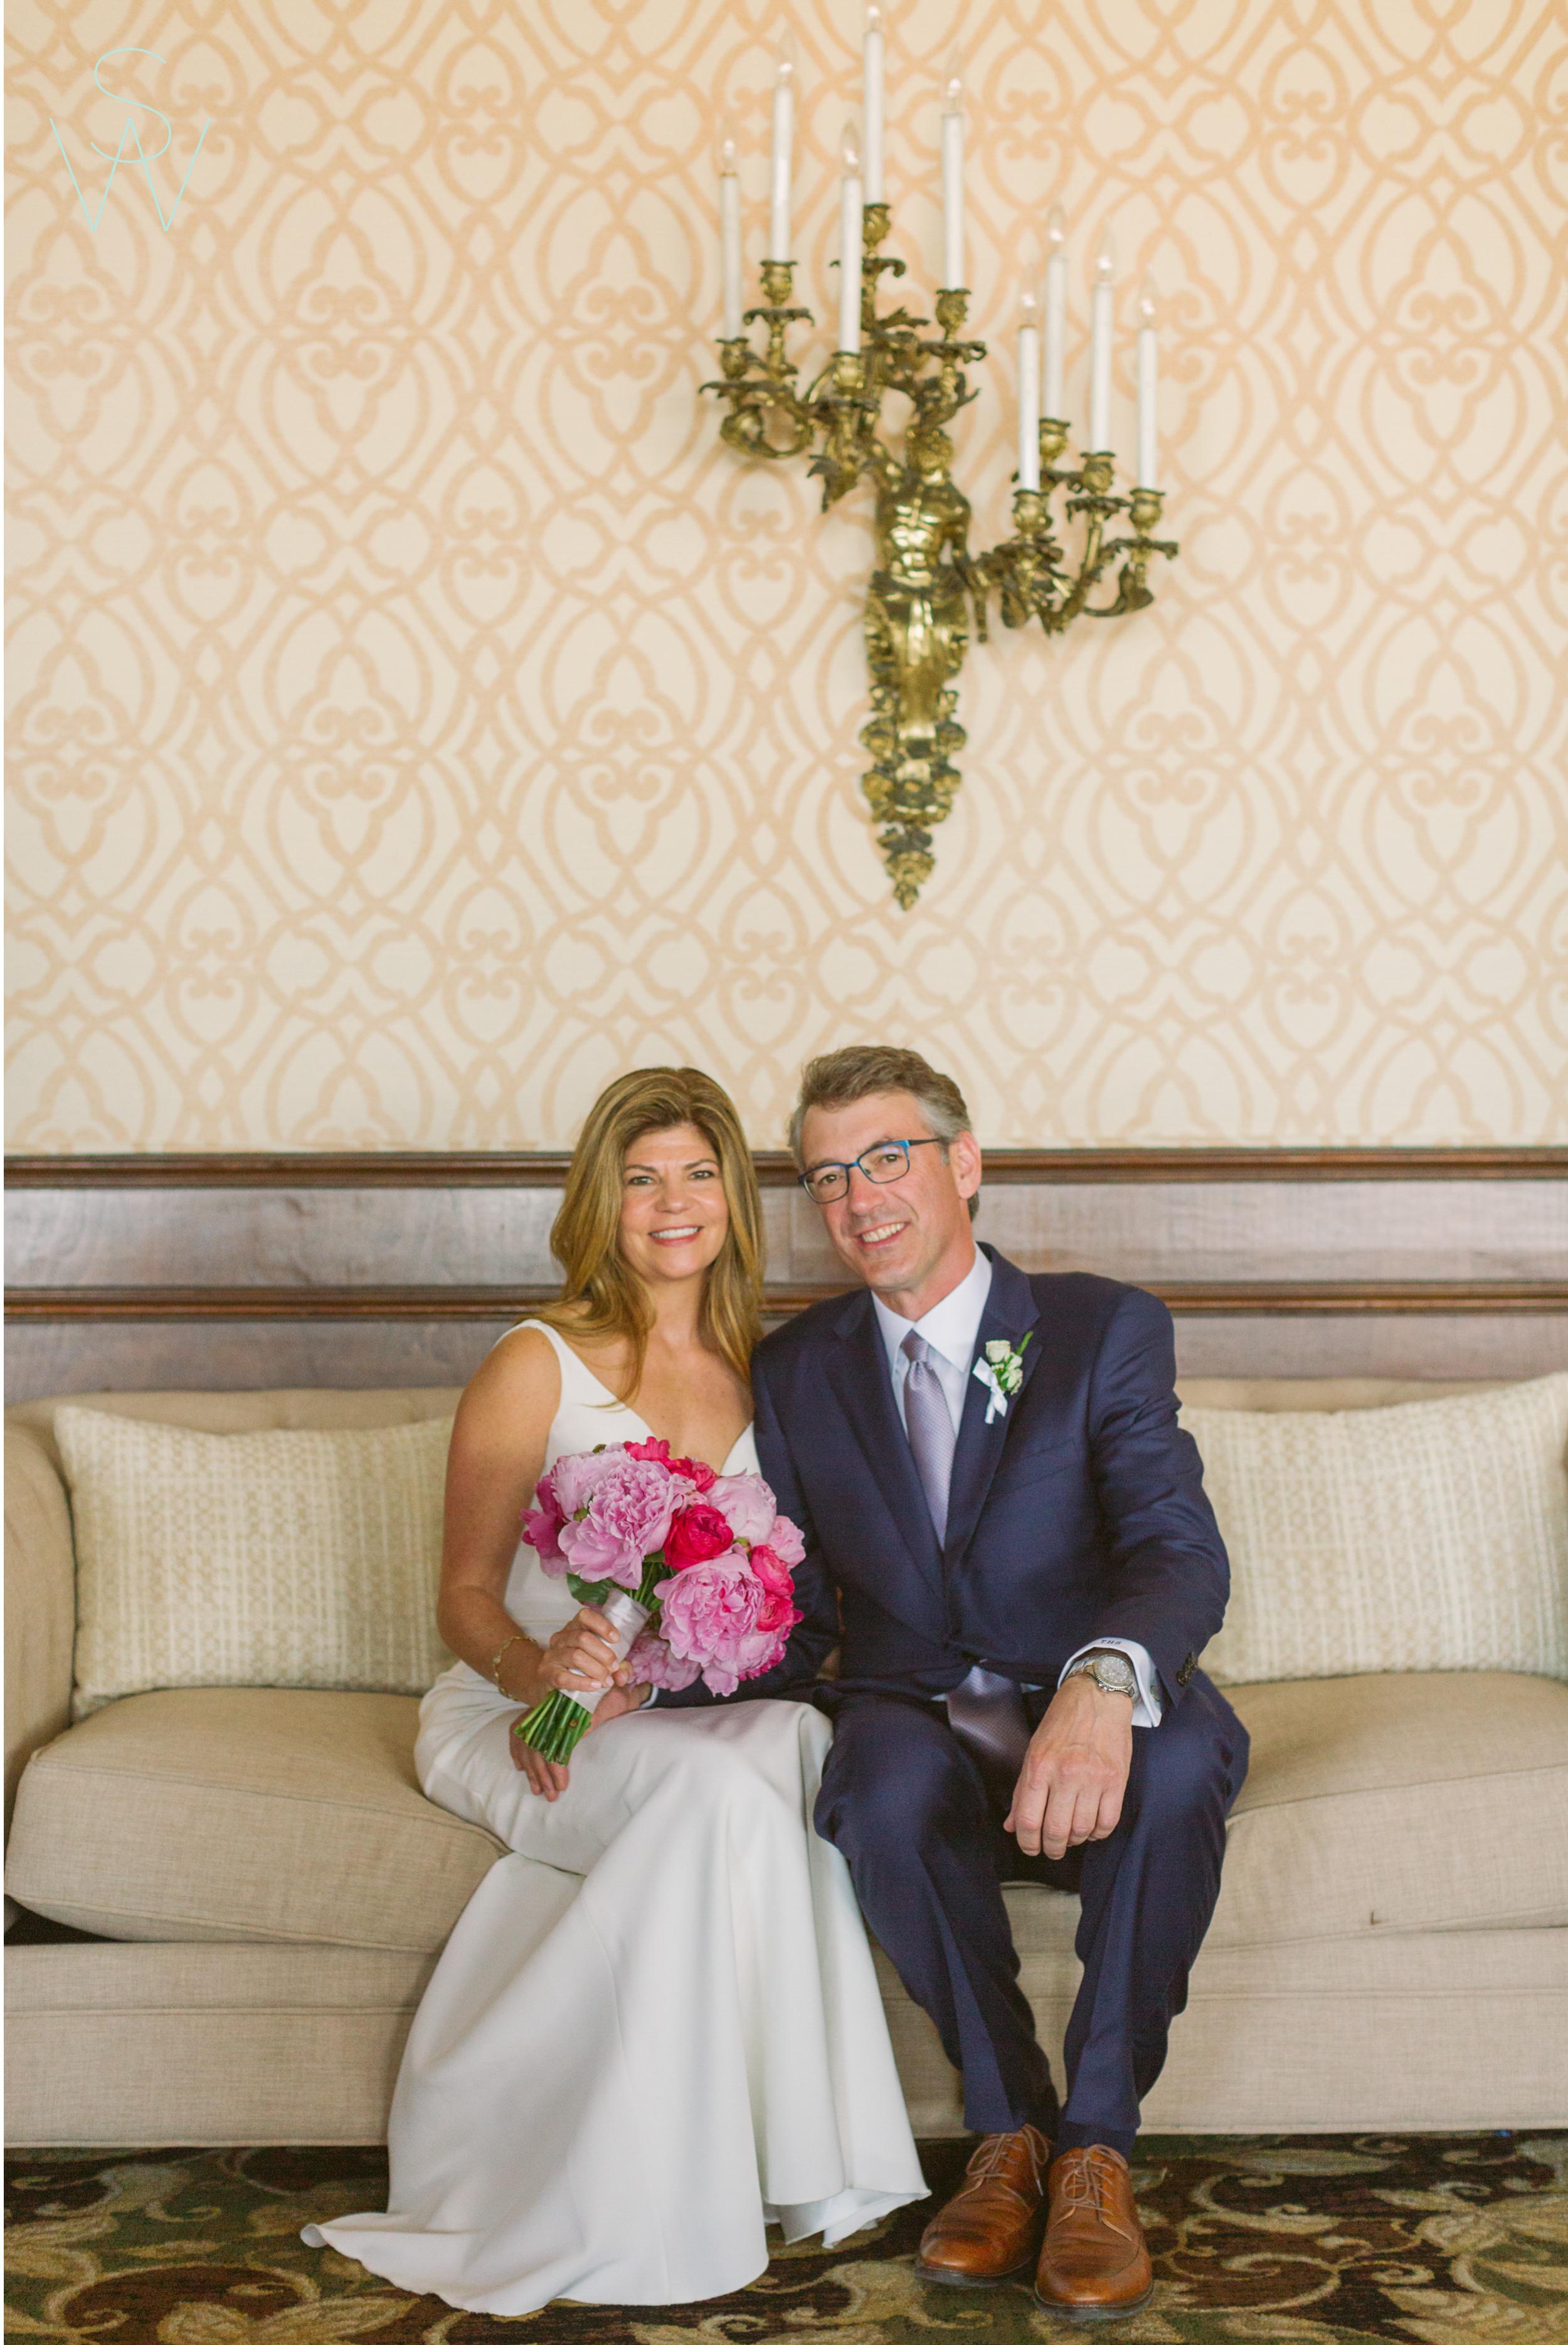 shewanders.wedding.photography.la.jolla-1011.jpg